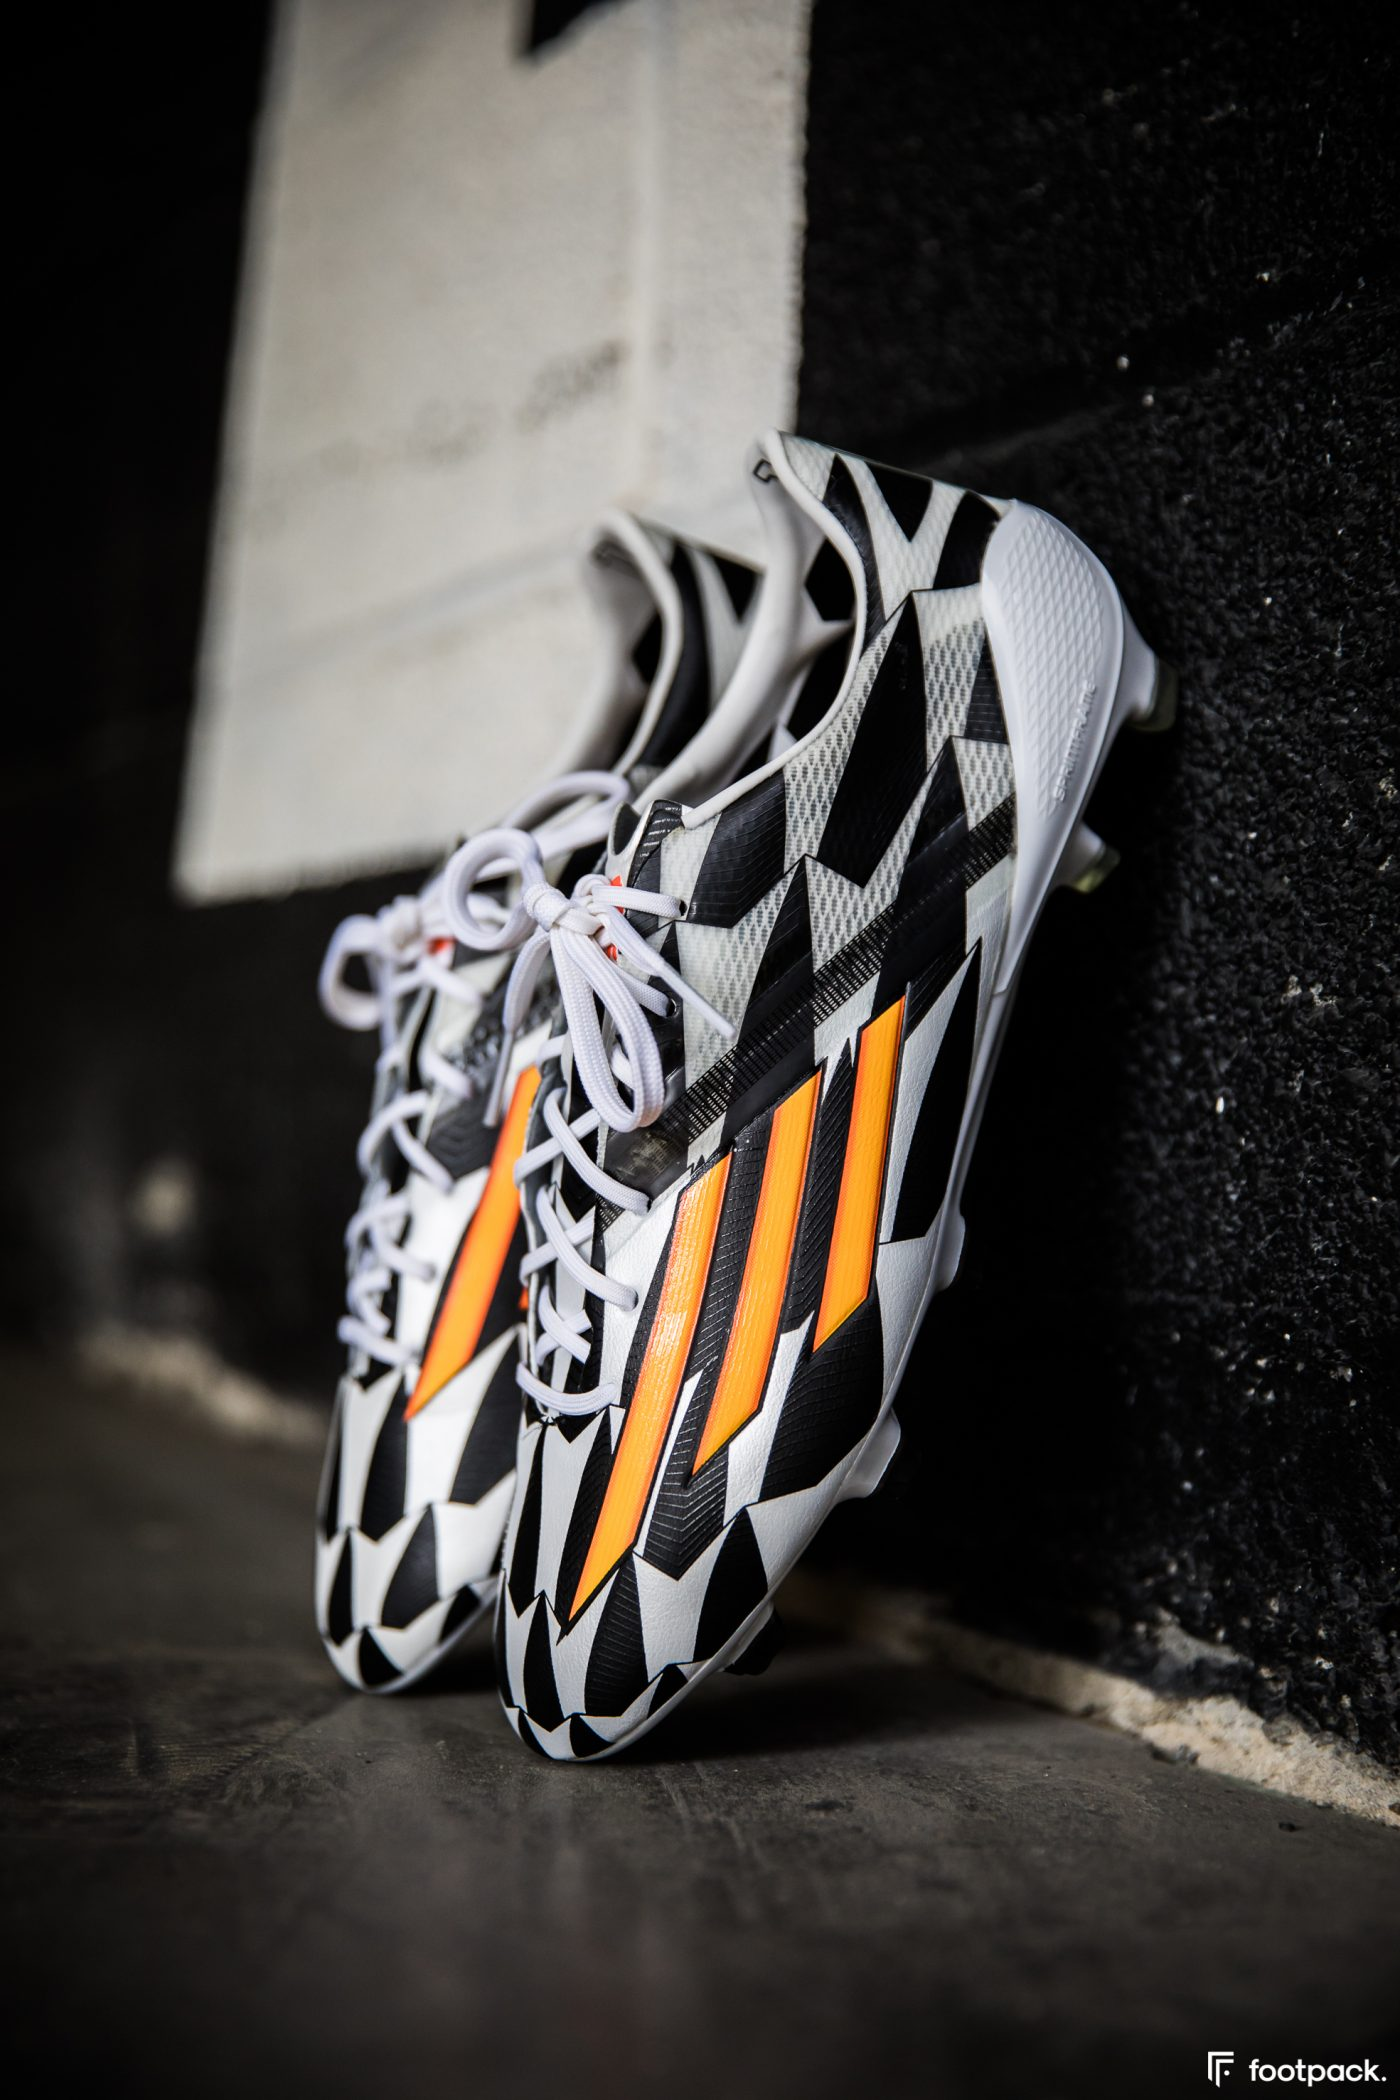 adidas-F50-adizero-battle-pack-coupe-du-monde-2014-footpack-5